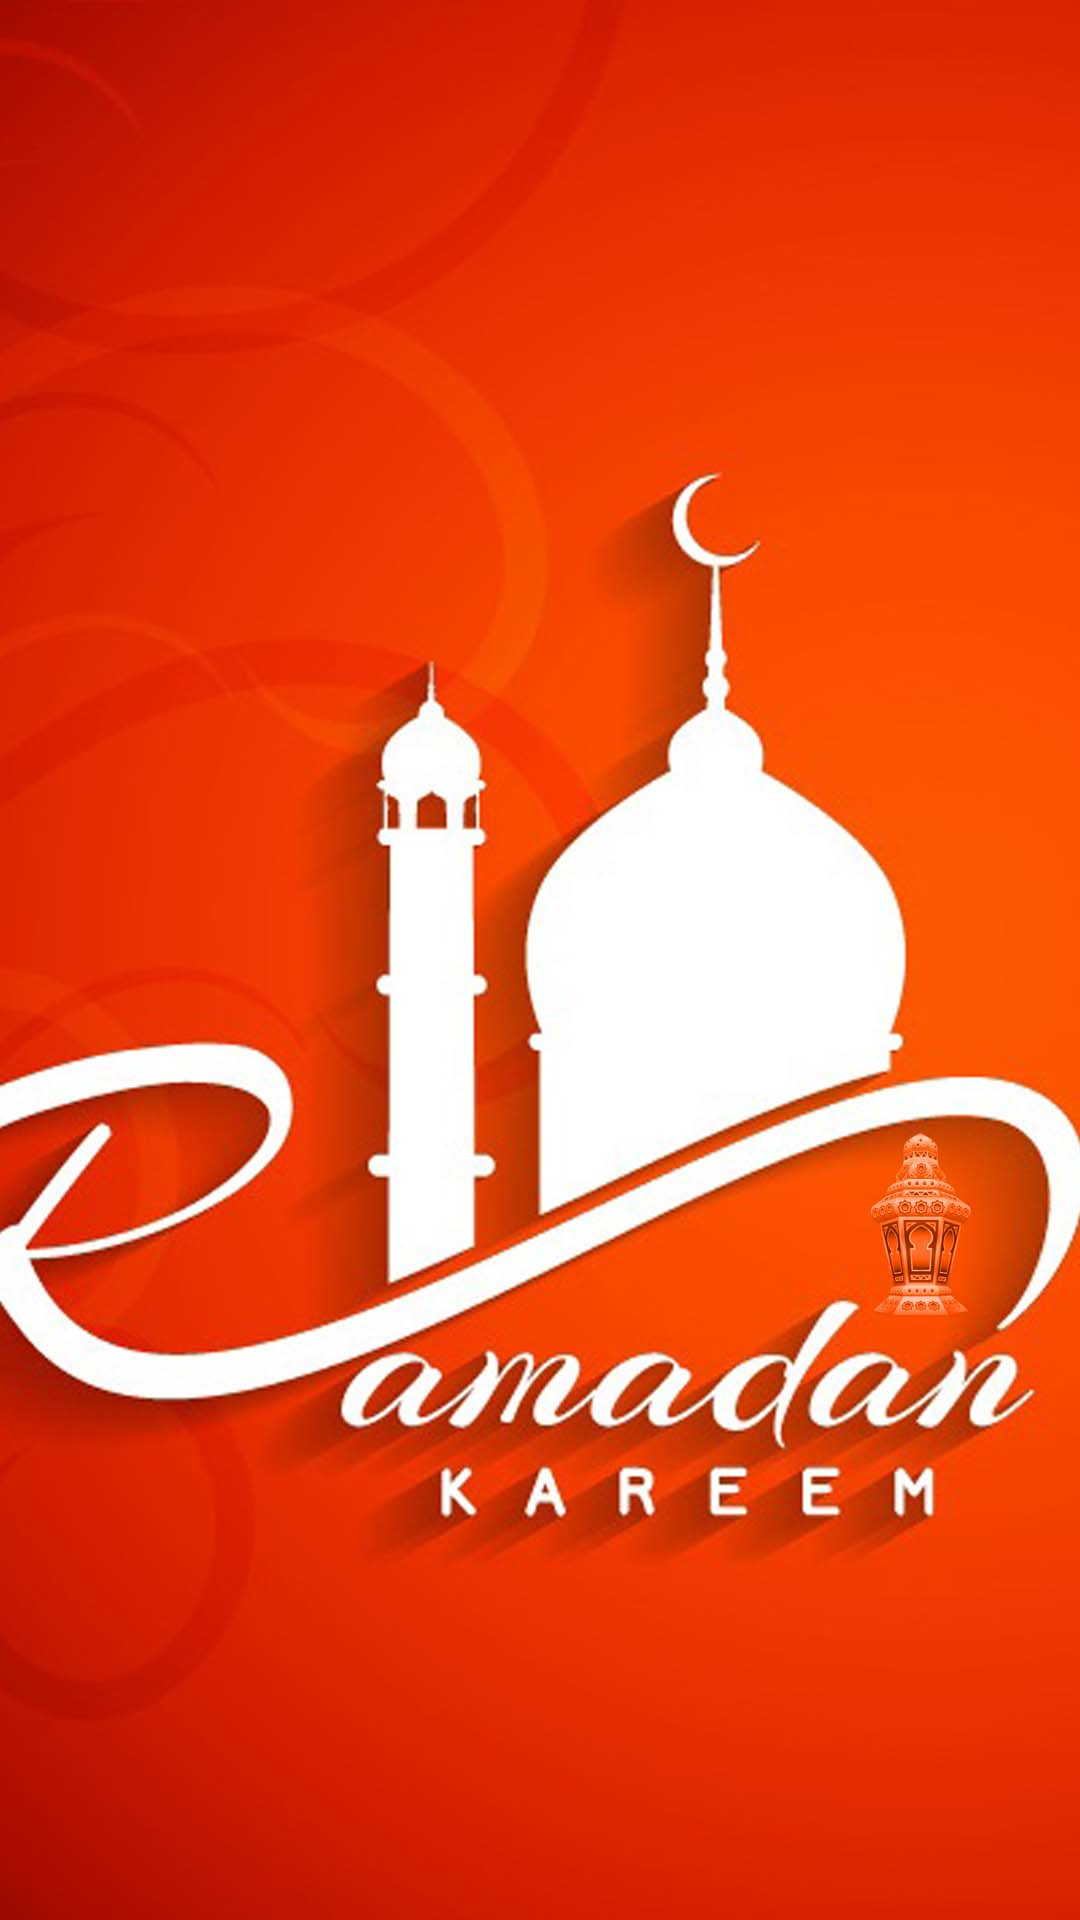 خلفيات موبايل رمضان كريم Mobile Wallpapers HD 6 خلفيات موبايل رمضان كريم Mobile Wallpapers HD